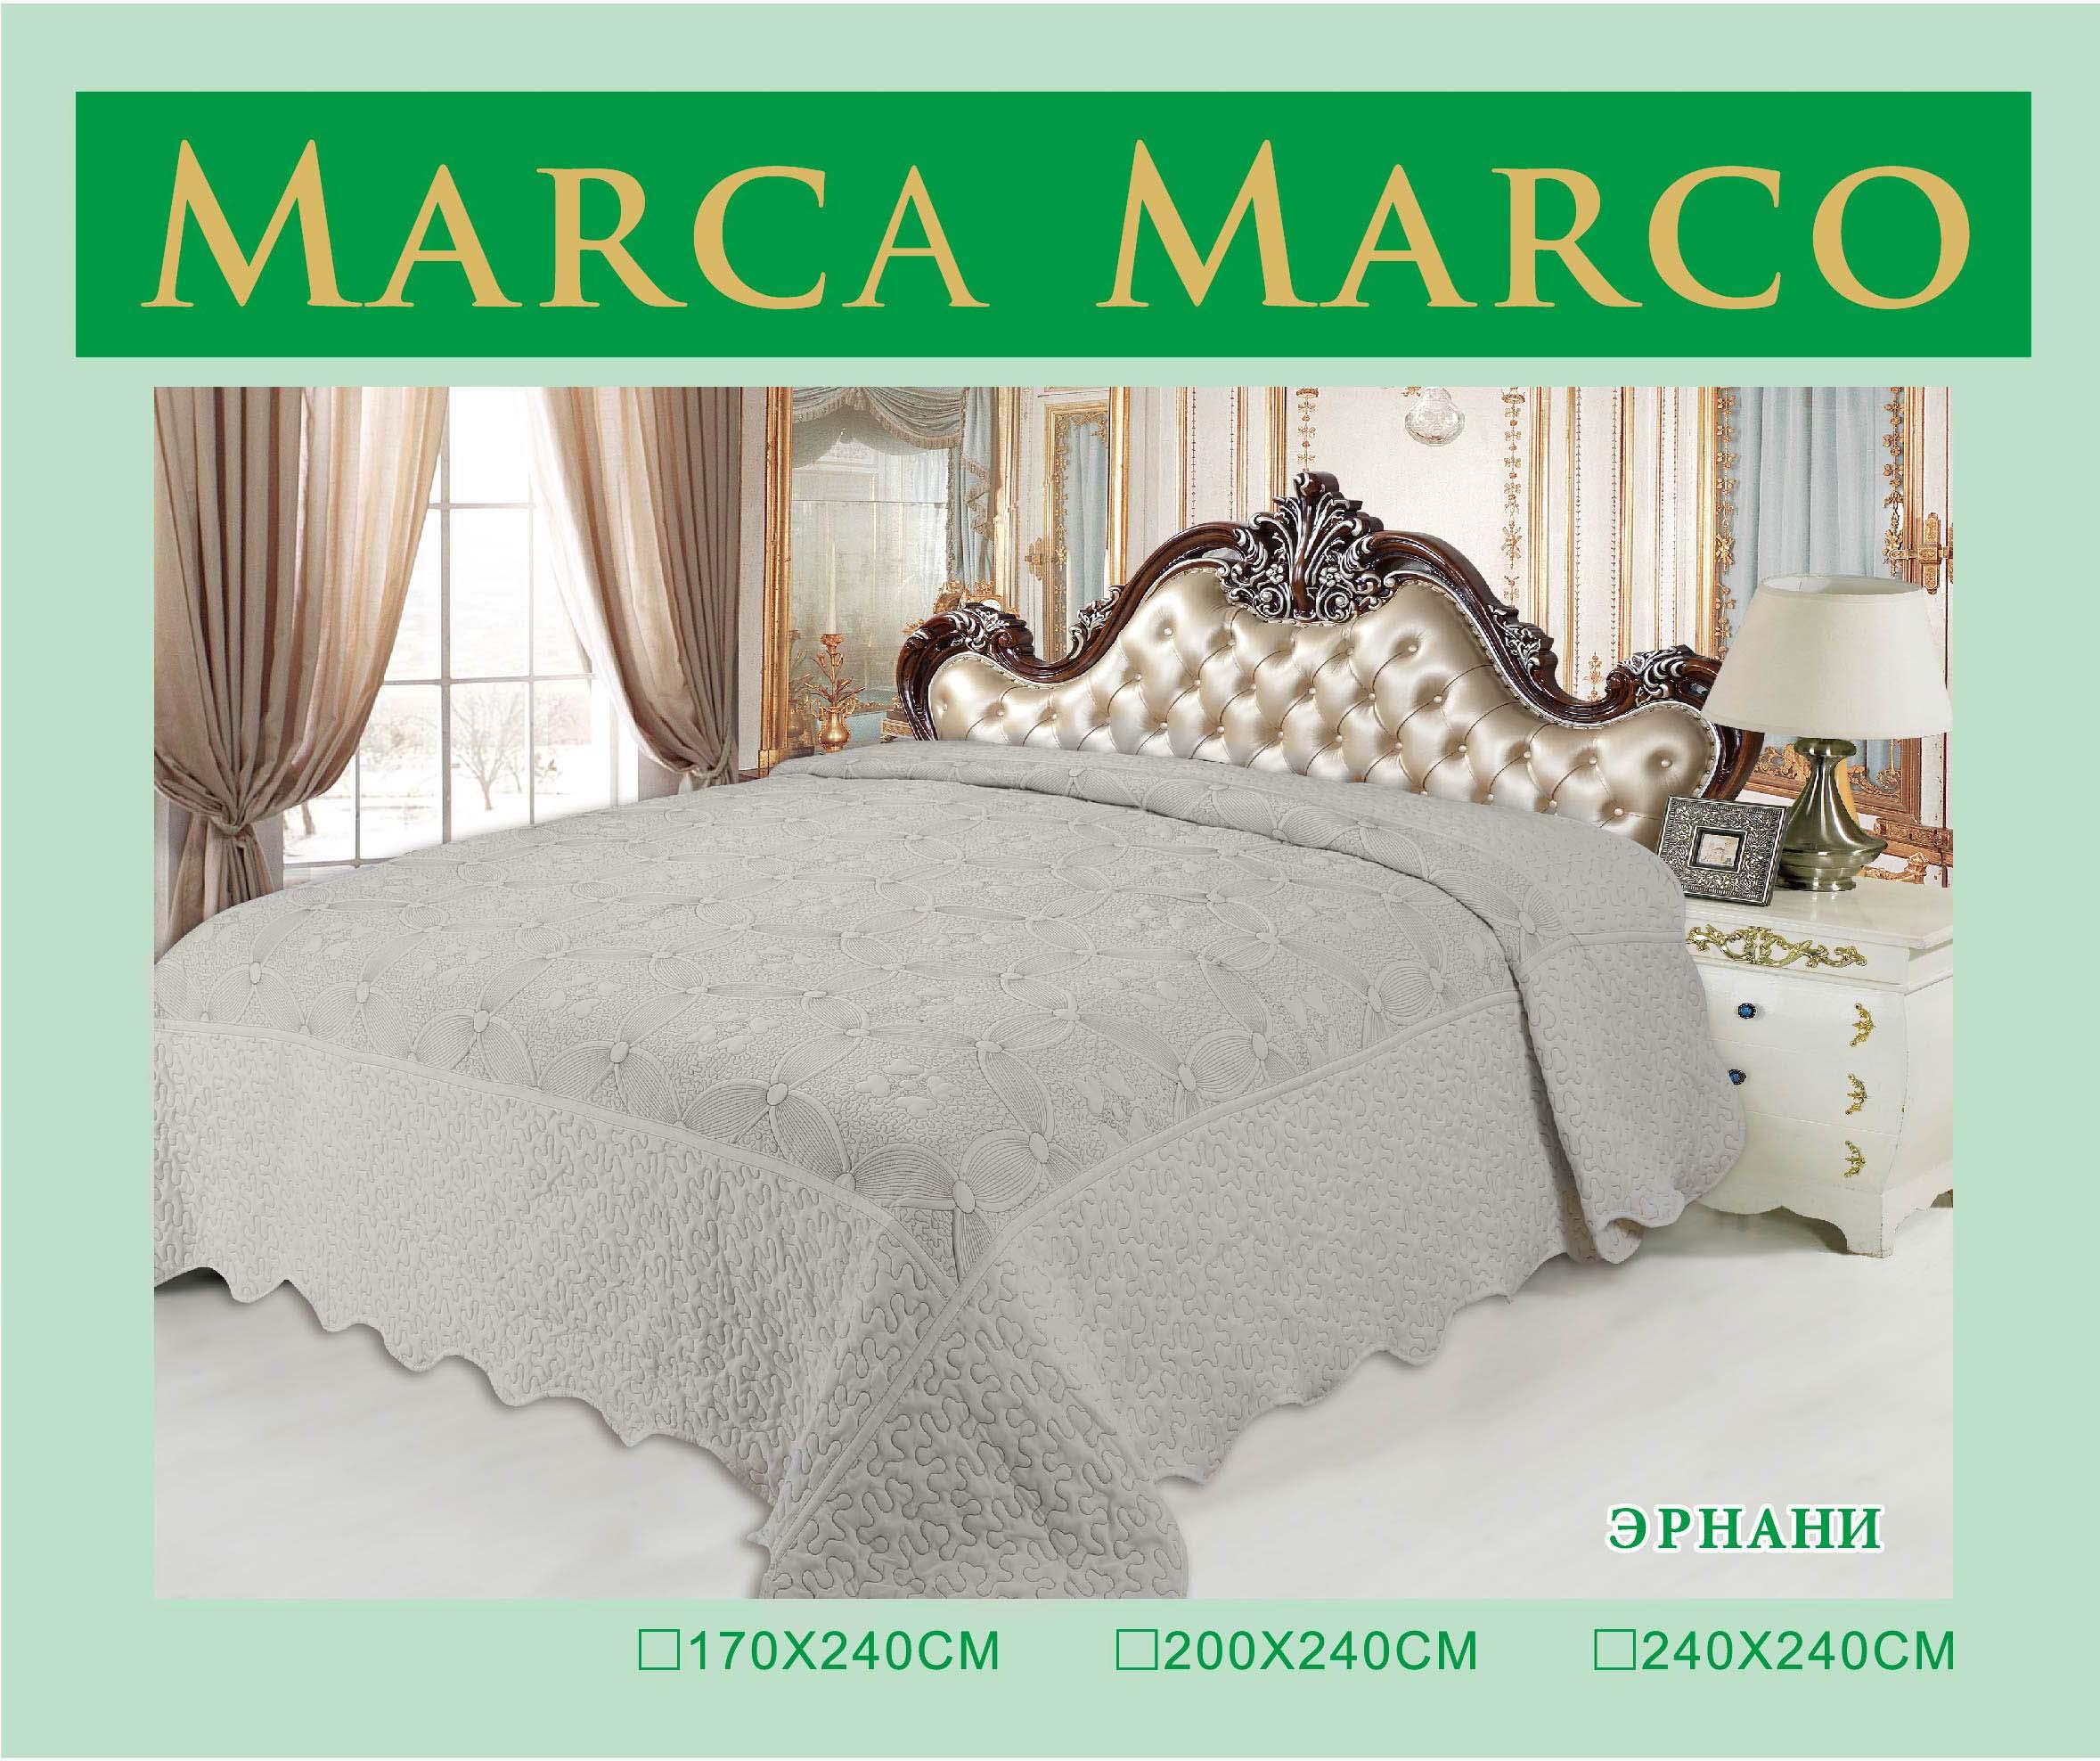 Пледы и покрывала MАRCA MARCO Покрывало Эрнани (170х240 см) покрывало mаrca marco покрывало эгль 170х240 см